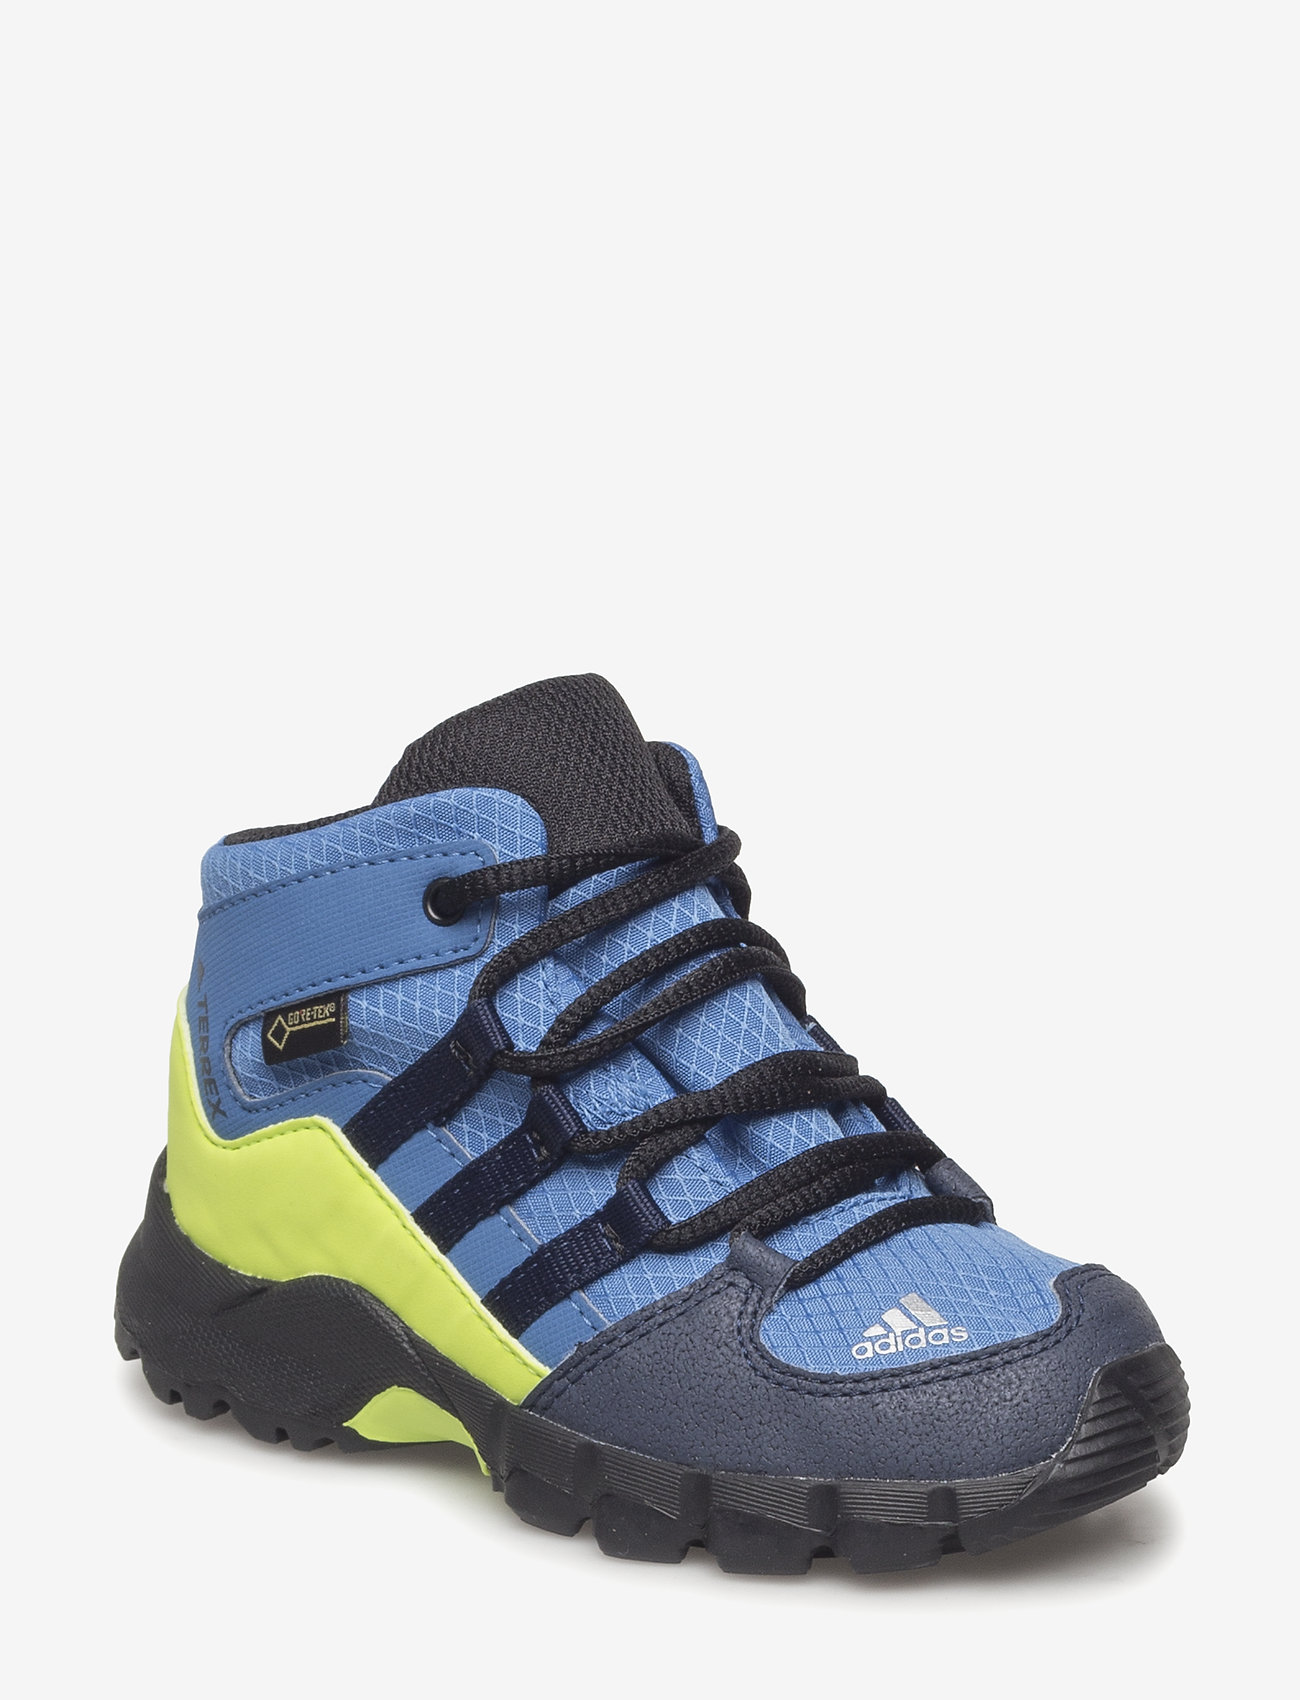 adidas Performance - TERREX MID GTX I - bottes - traroy/conavy/sslime